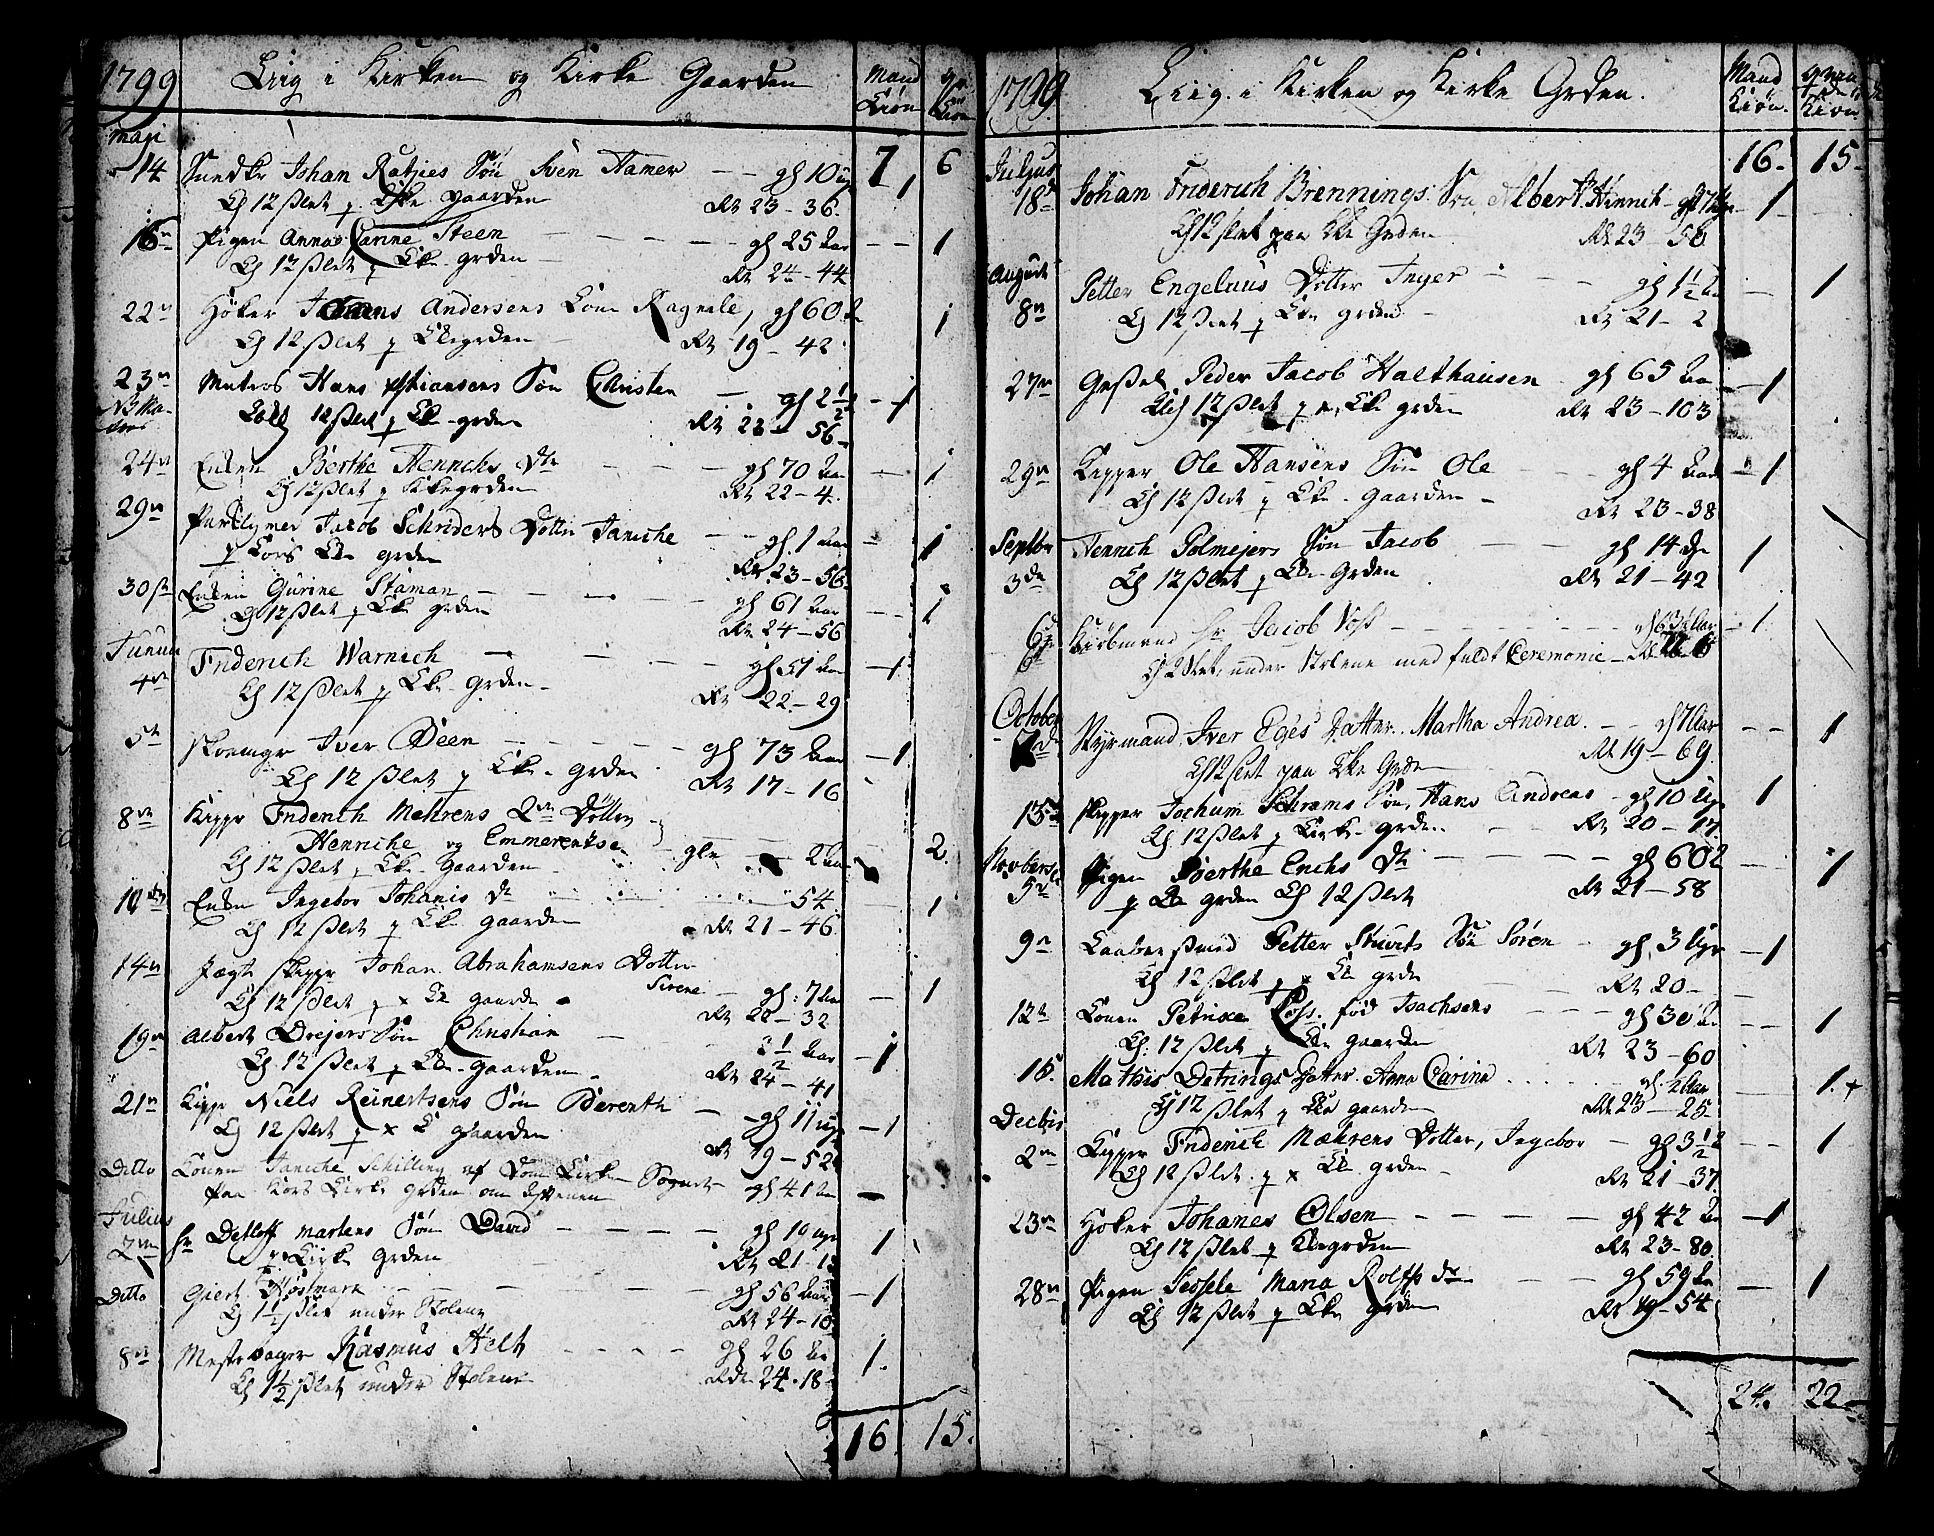 SAB, Korskirken Sokneprestembete, H/Haa/L0012: Ministerialbok nr. A 12, 1786-1832, s. 158